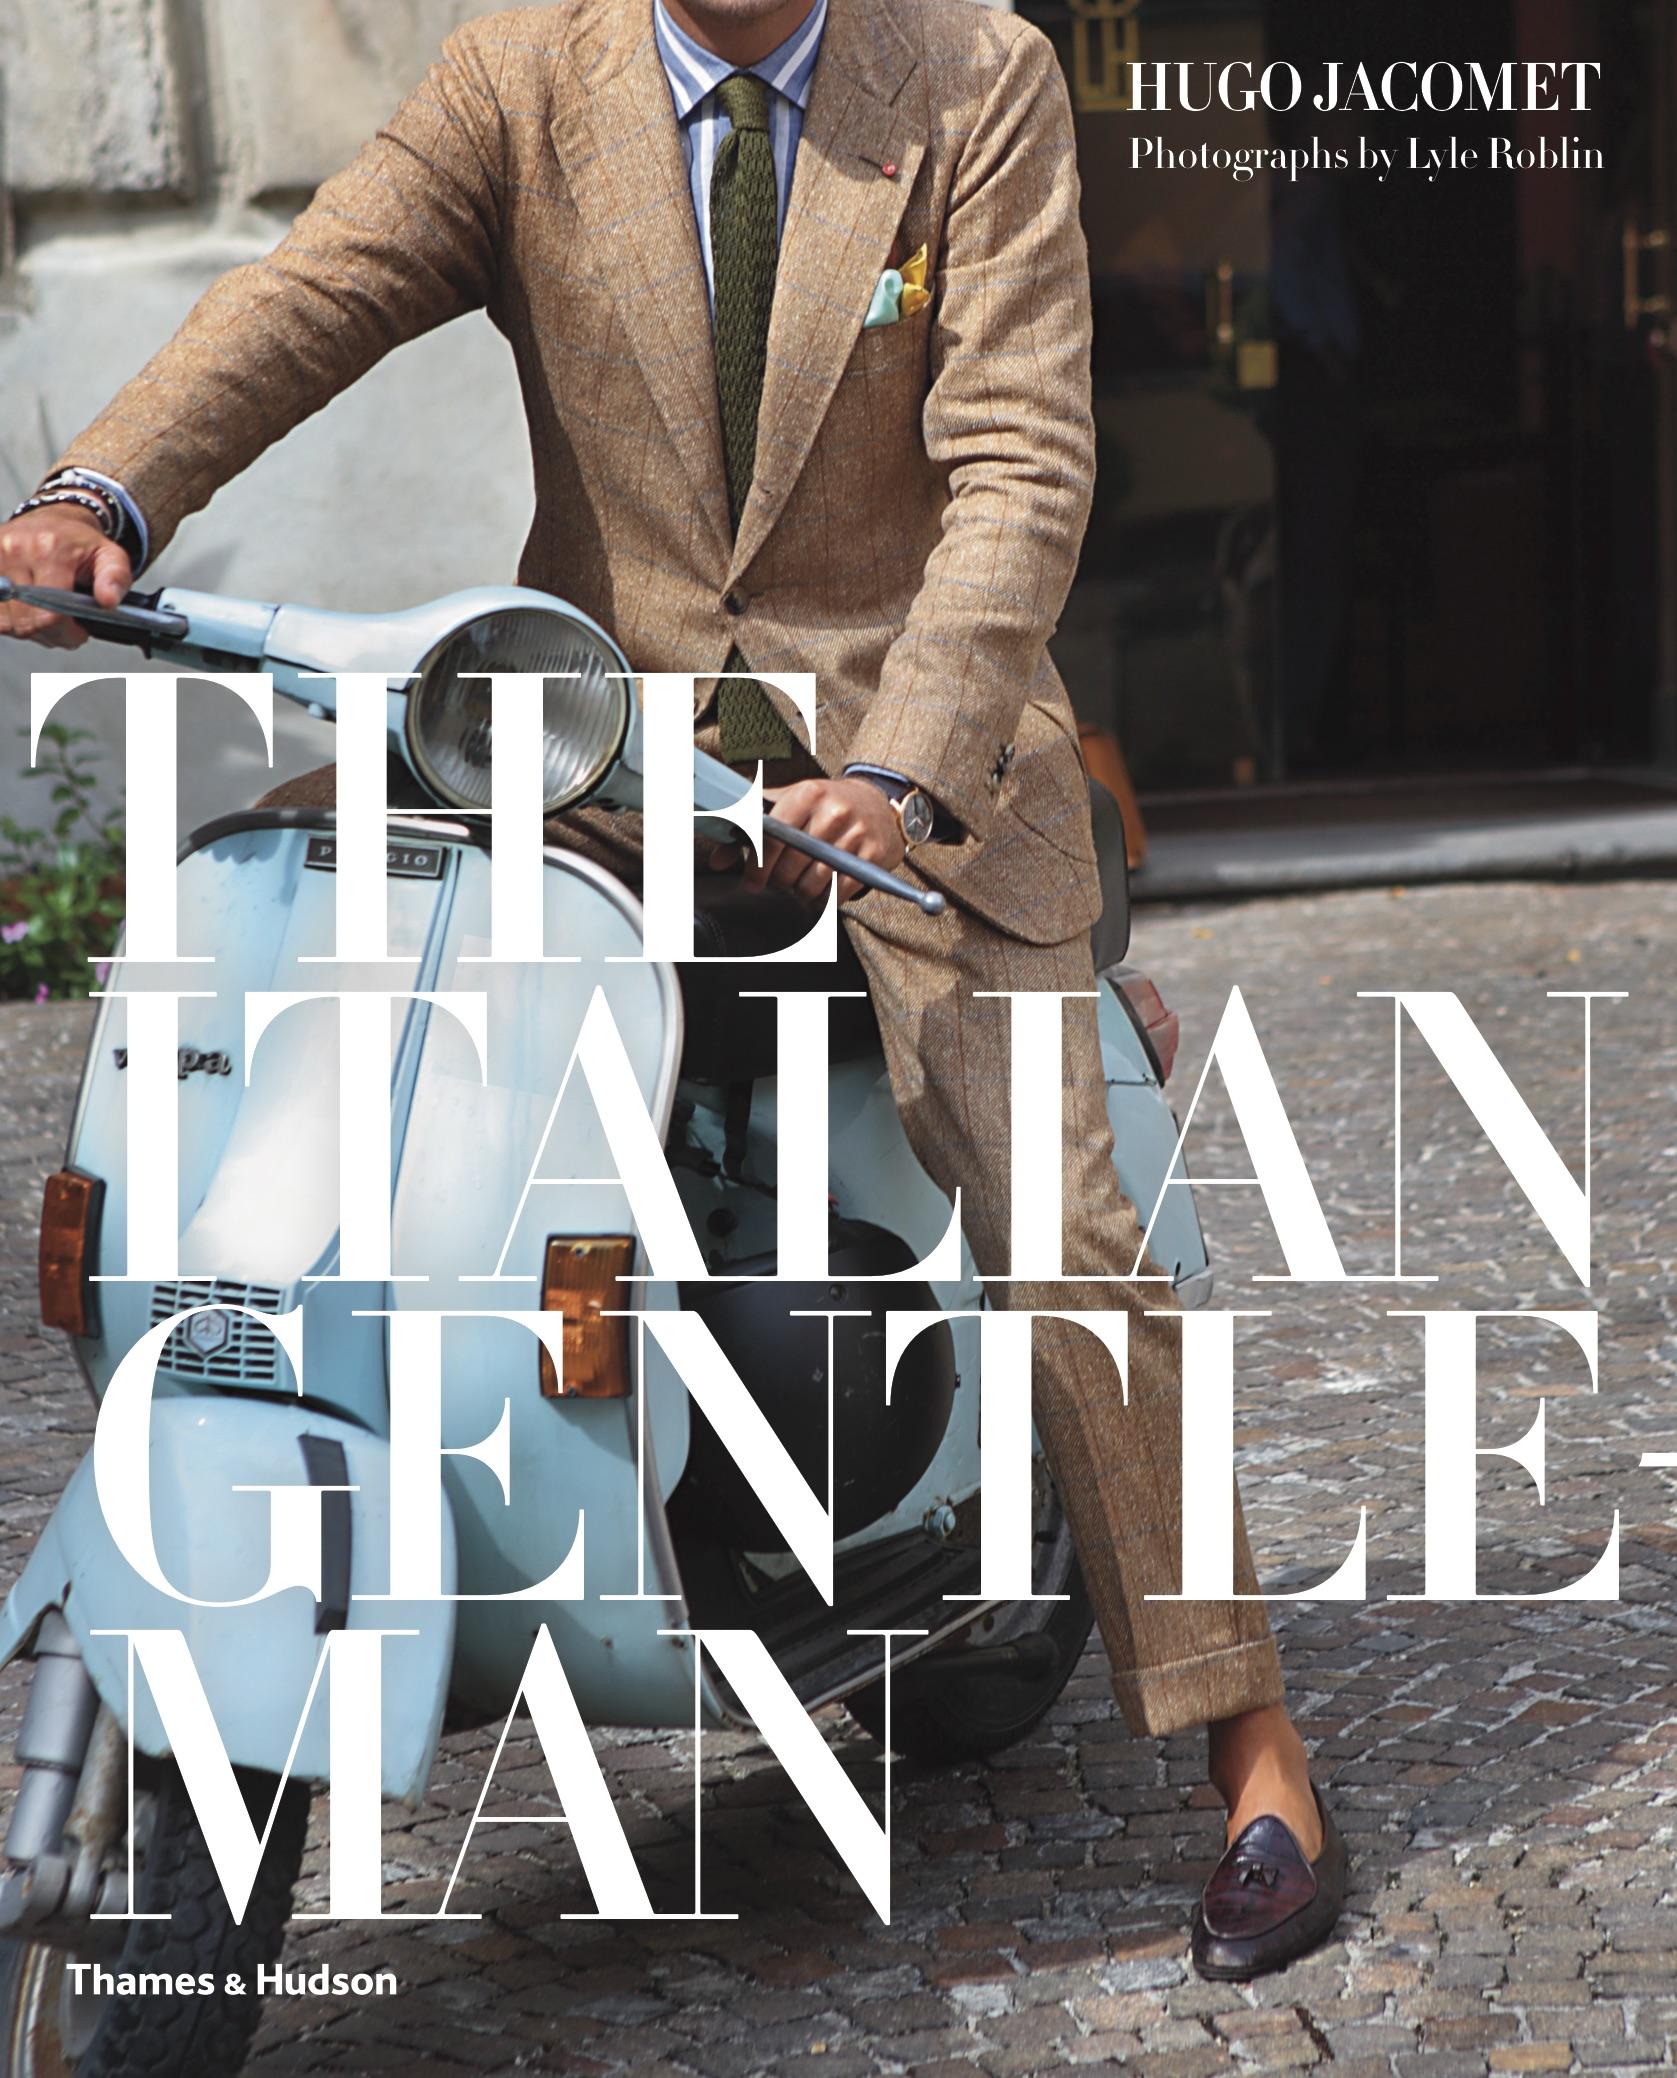 The Italian Gentleman : The Preface